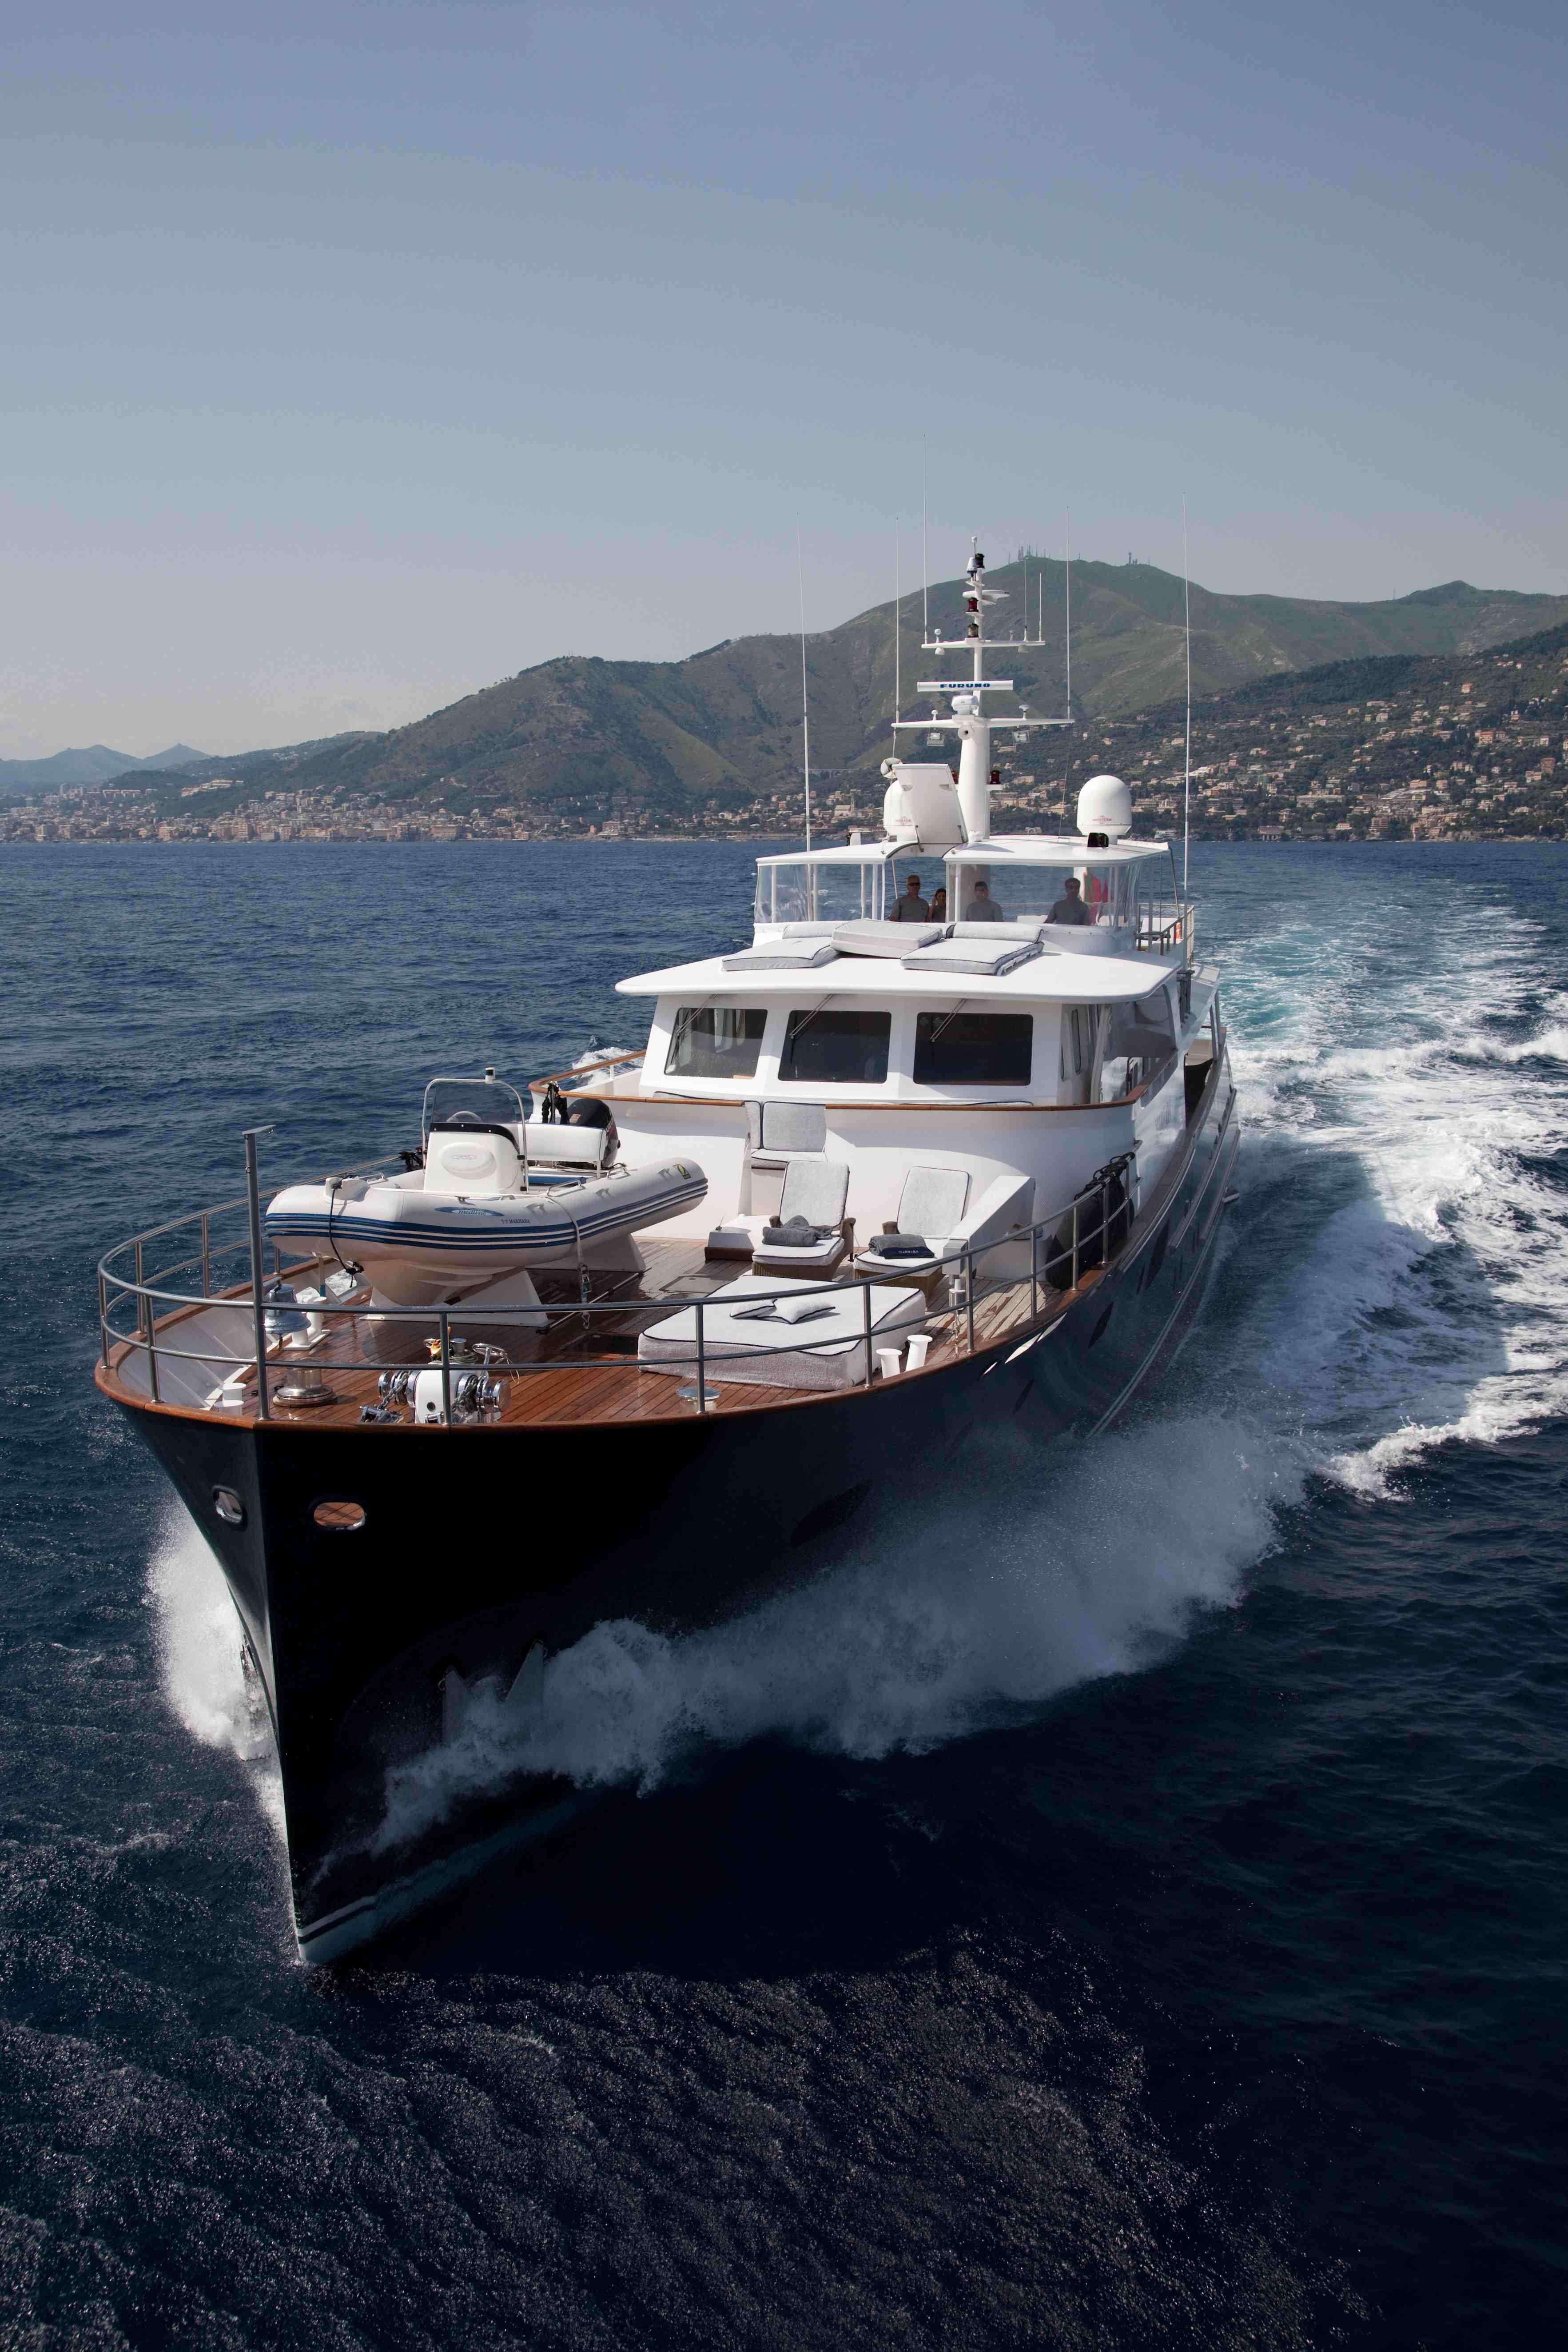 PERSUADER Yacht Charter Details OCEA 108 Fast Commuter